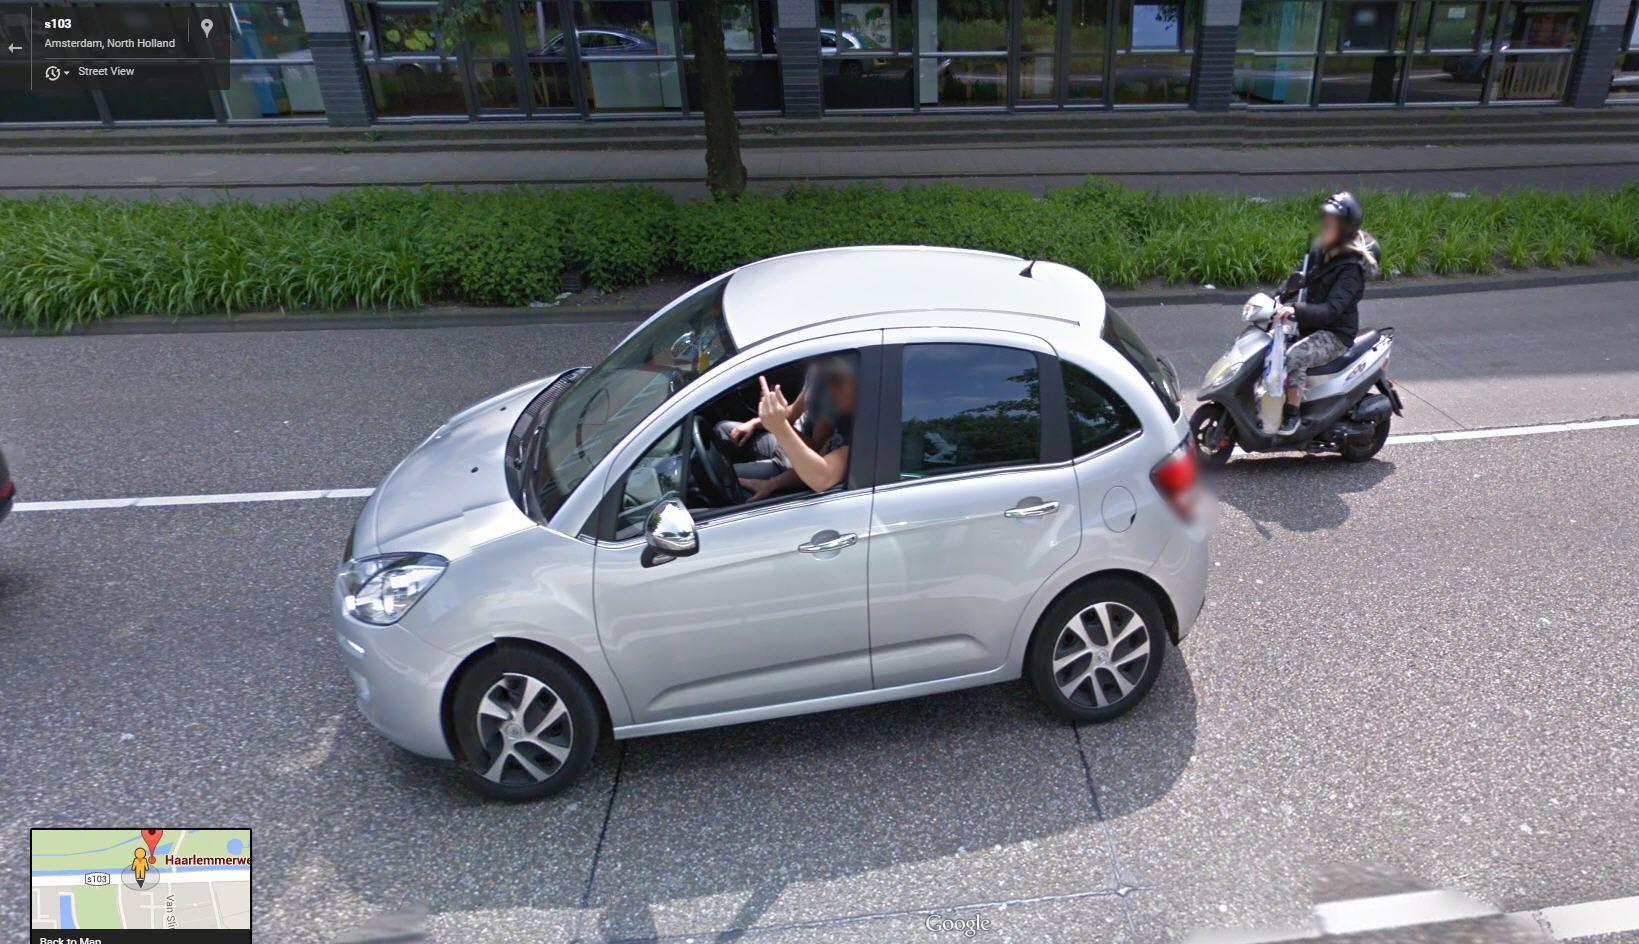 Good morning Google Street View Amsterdam